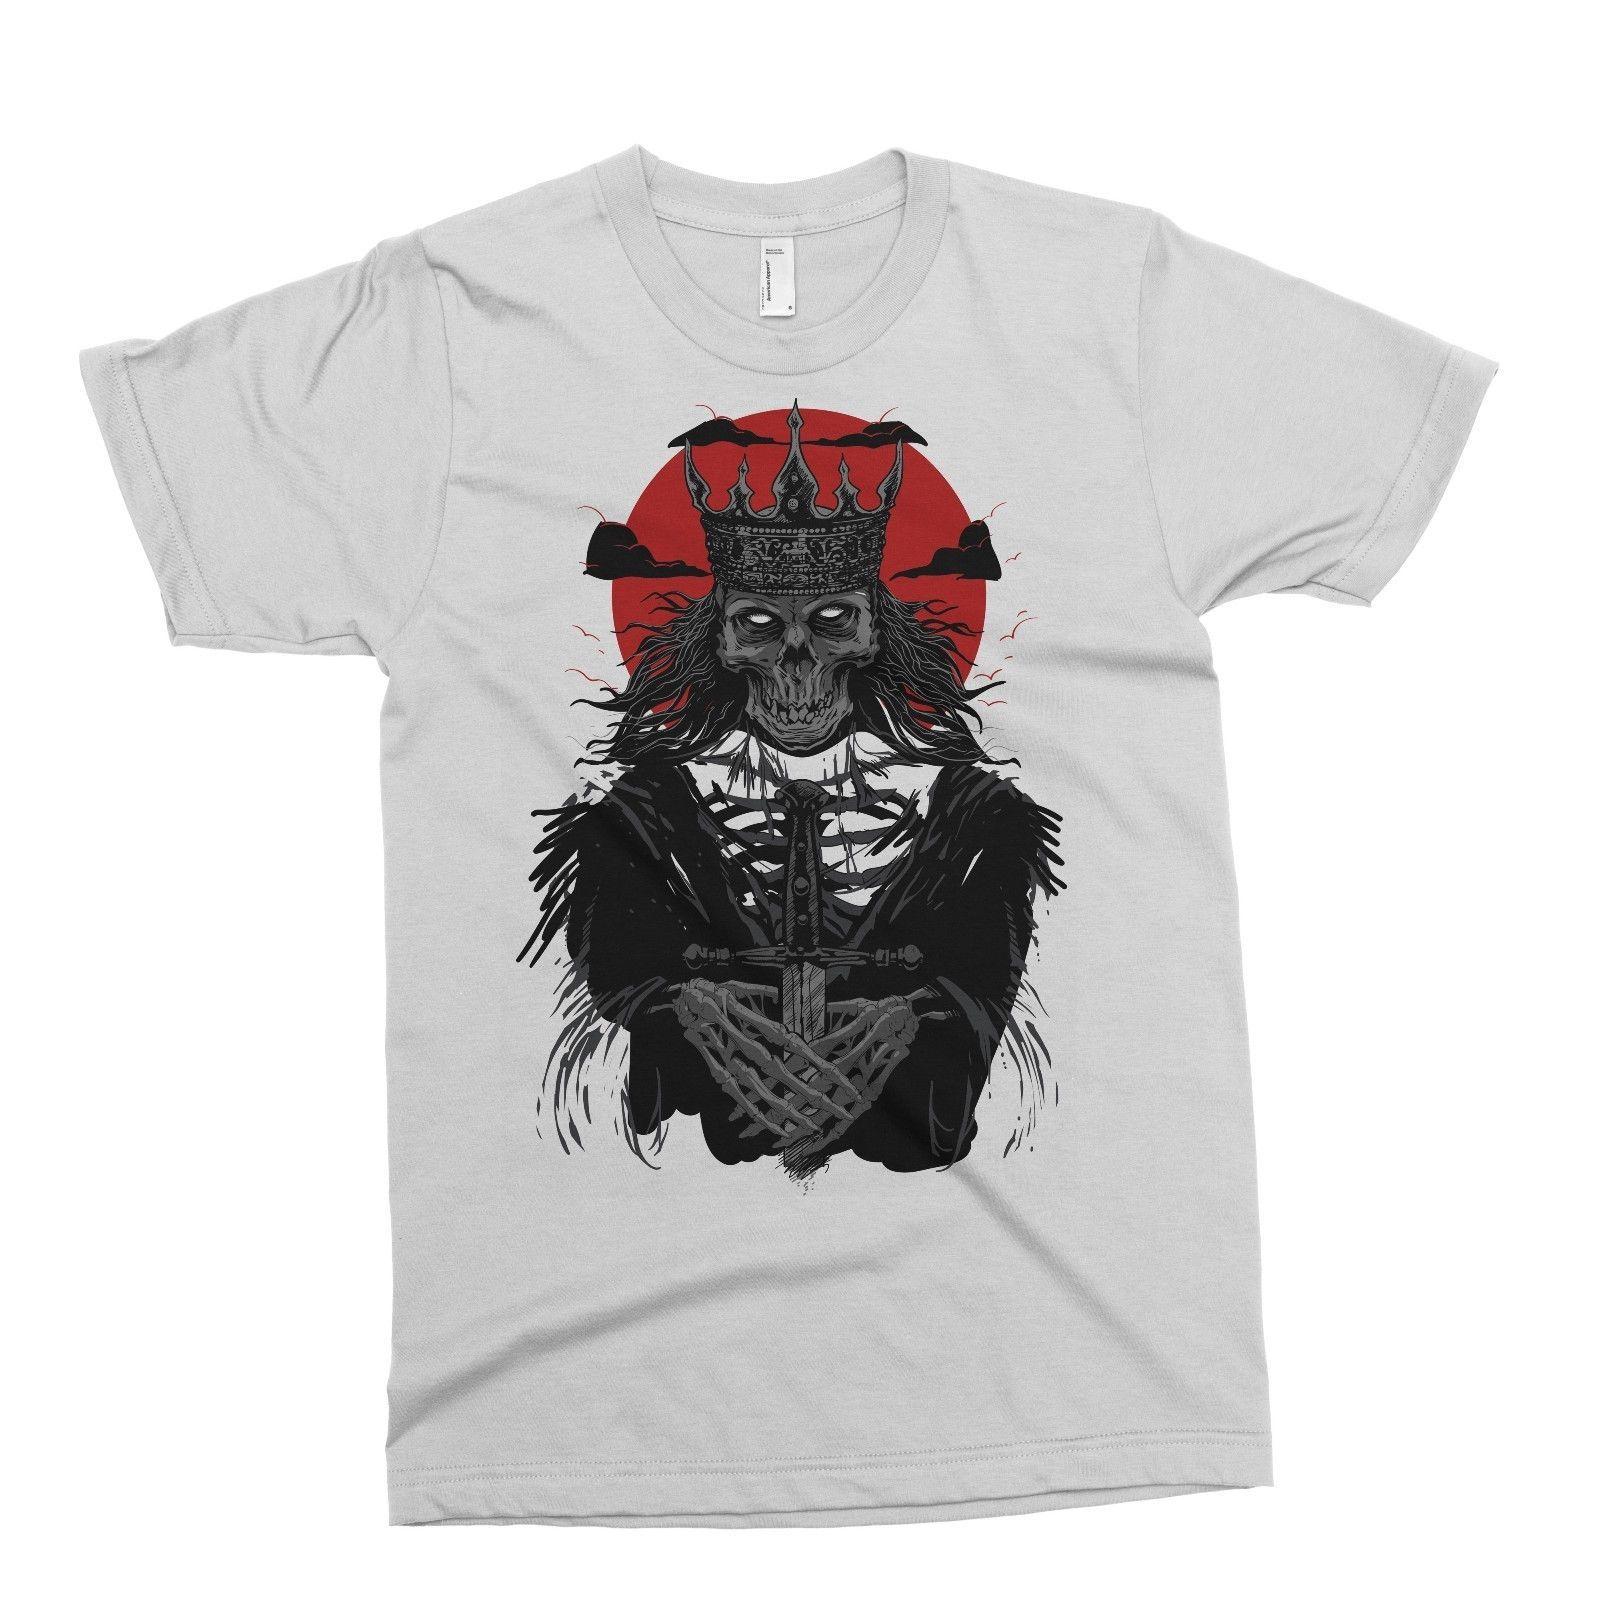 White Dead King T Shirt Tattoo Alternative Rebel Circus Drop Dead Tattoo O  Neck Fashion Casual High Quality Print T Shirt Fun Tshirts Party T Shirts